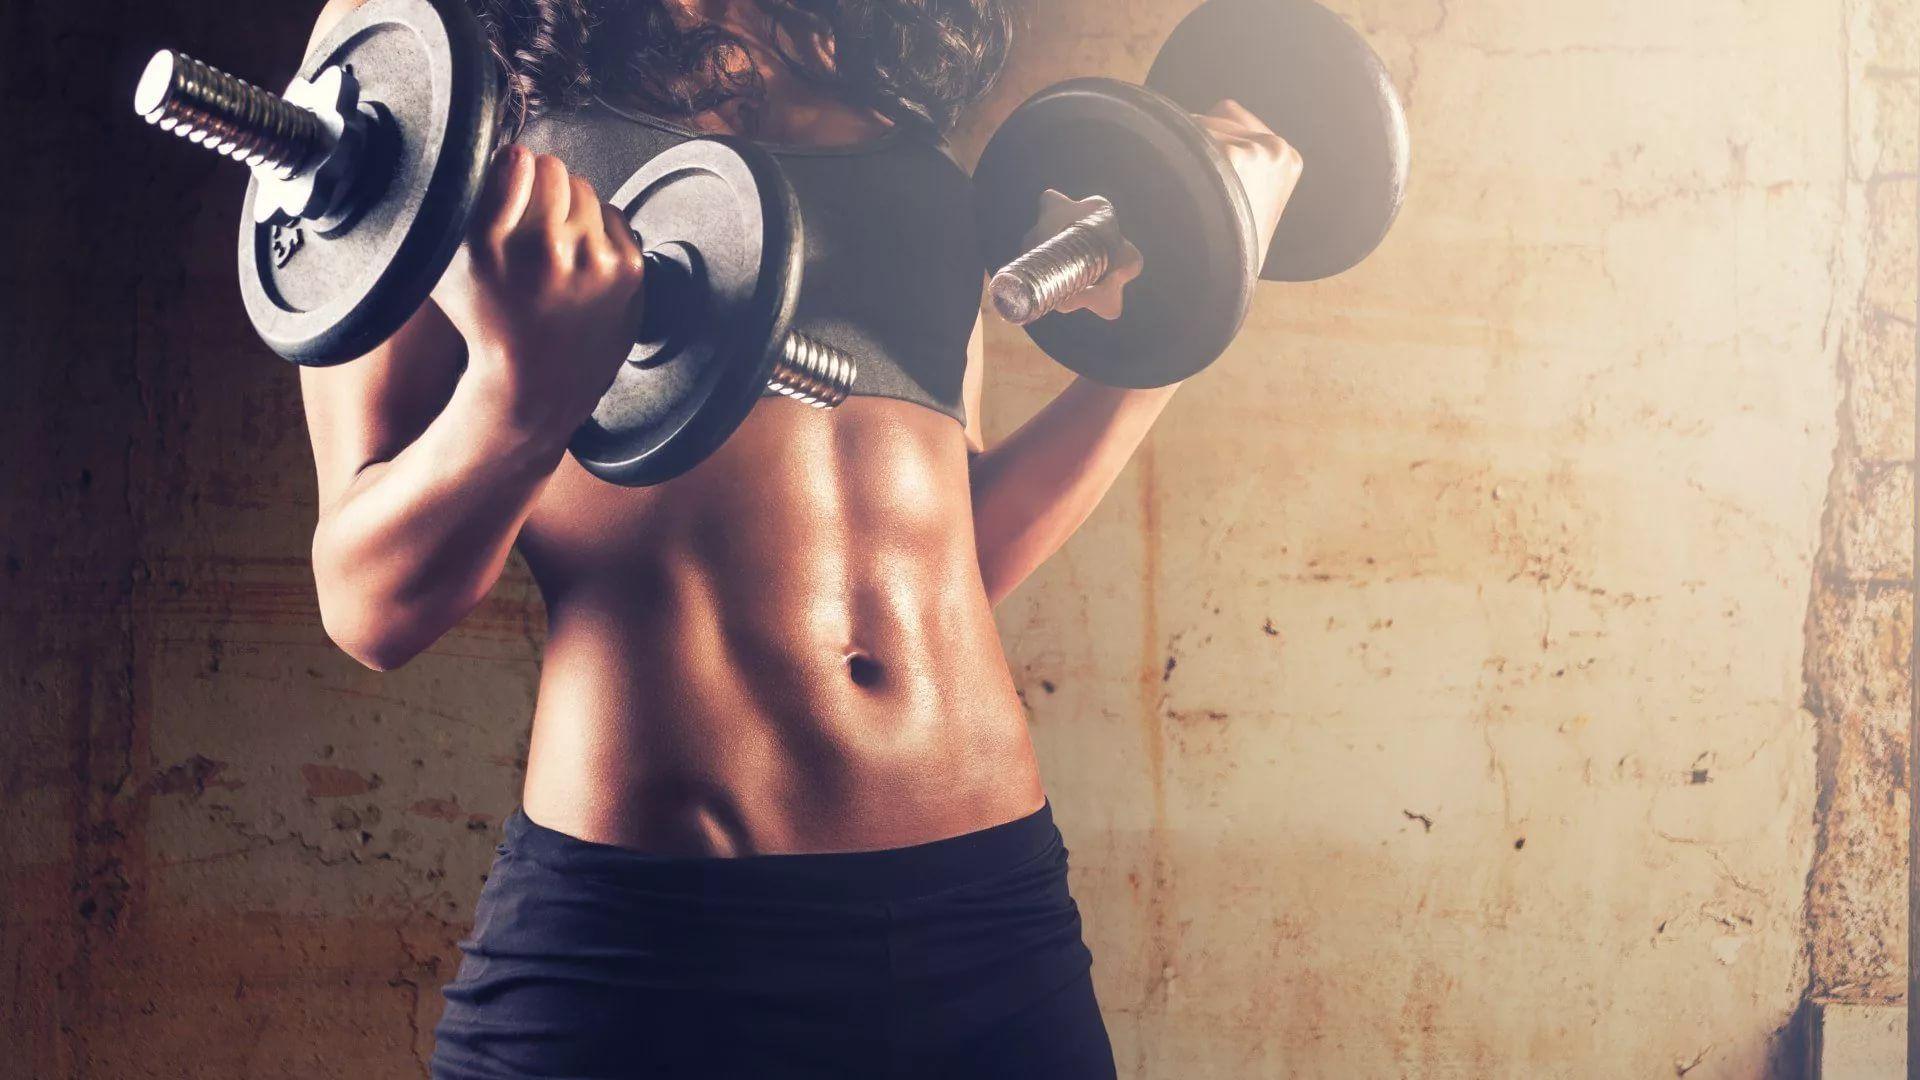 Workout Cool Wallpaper